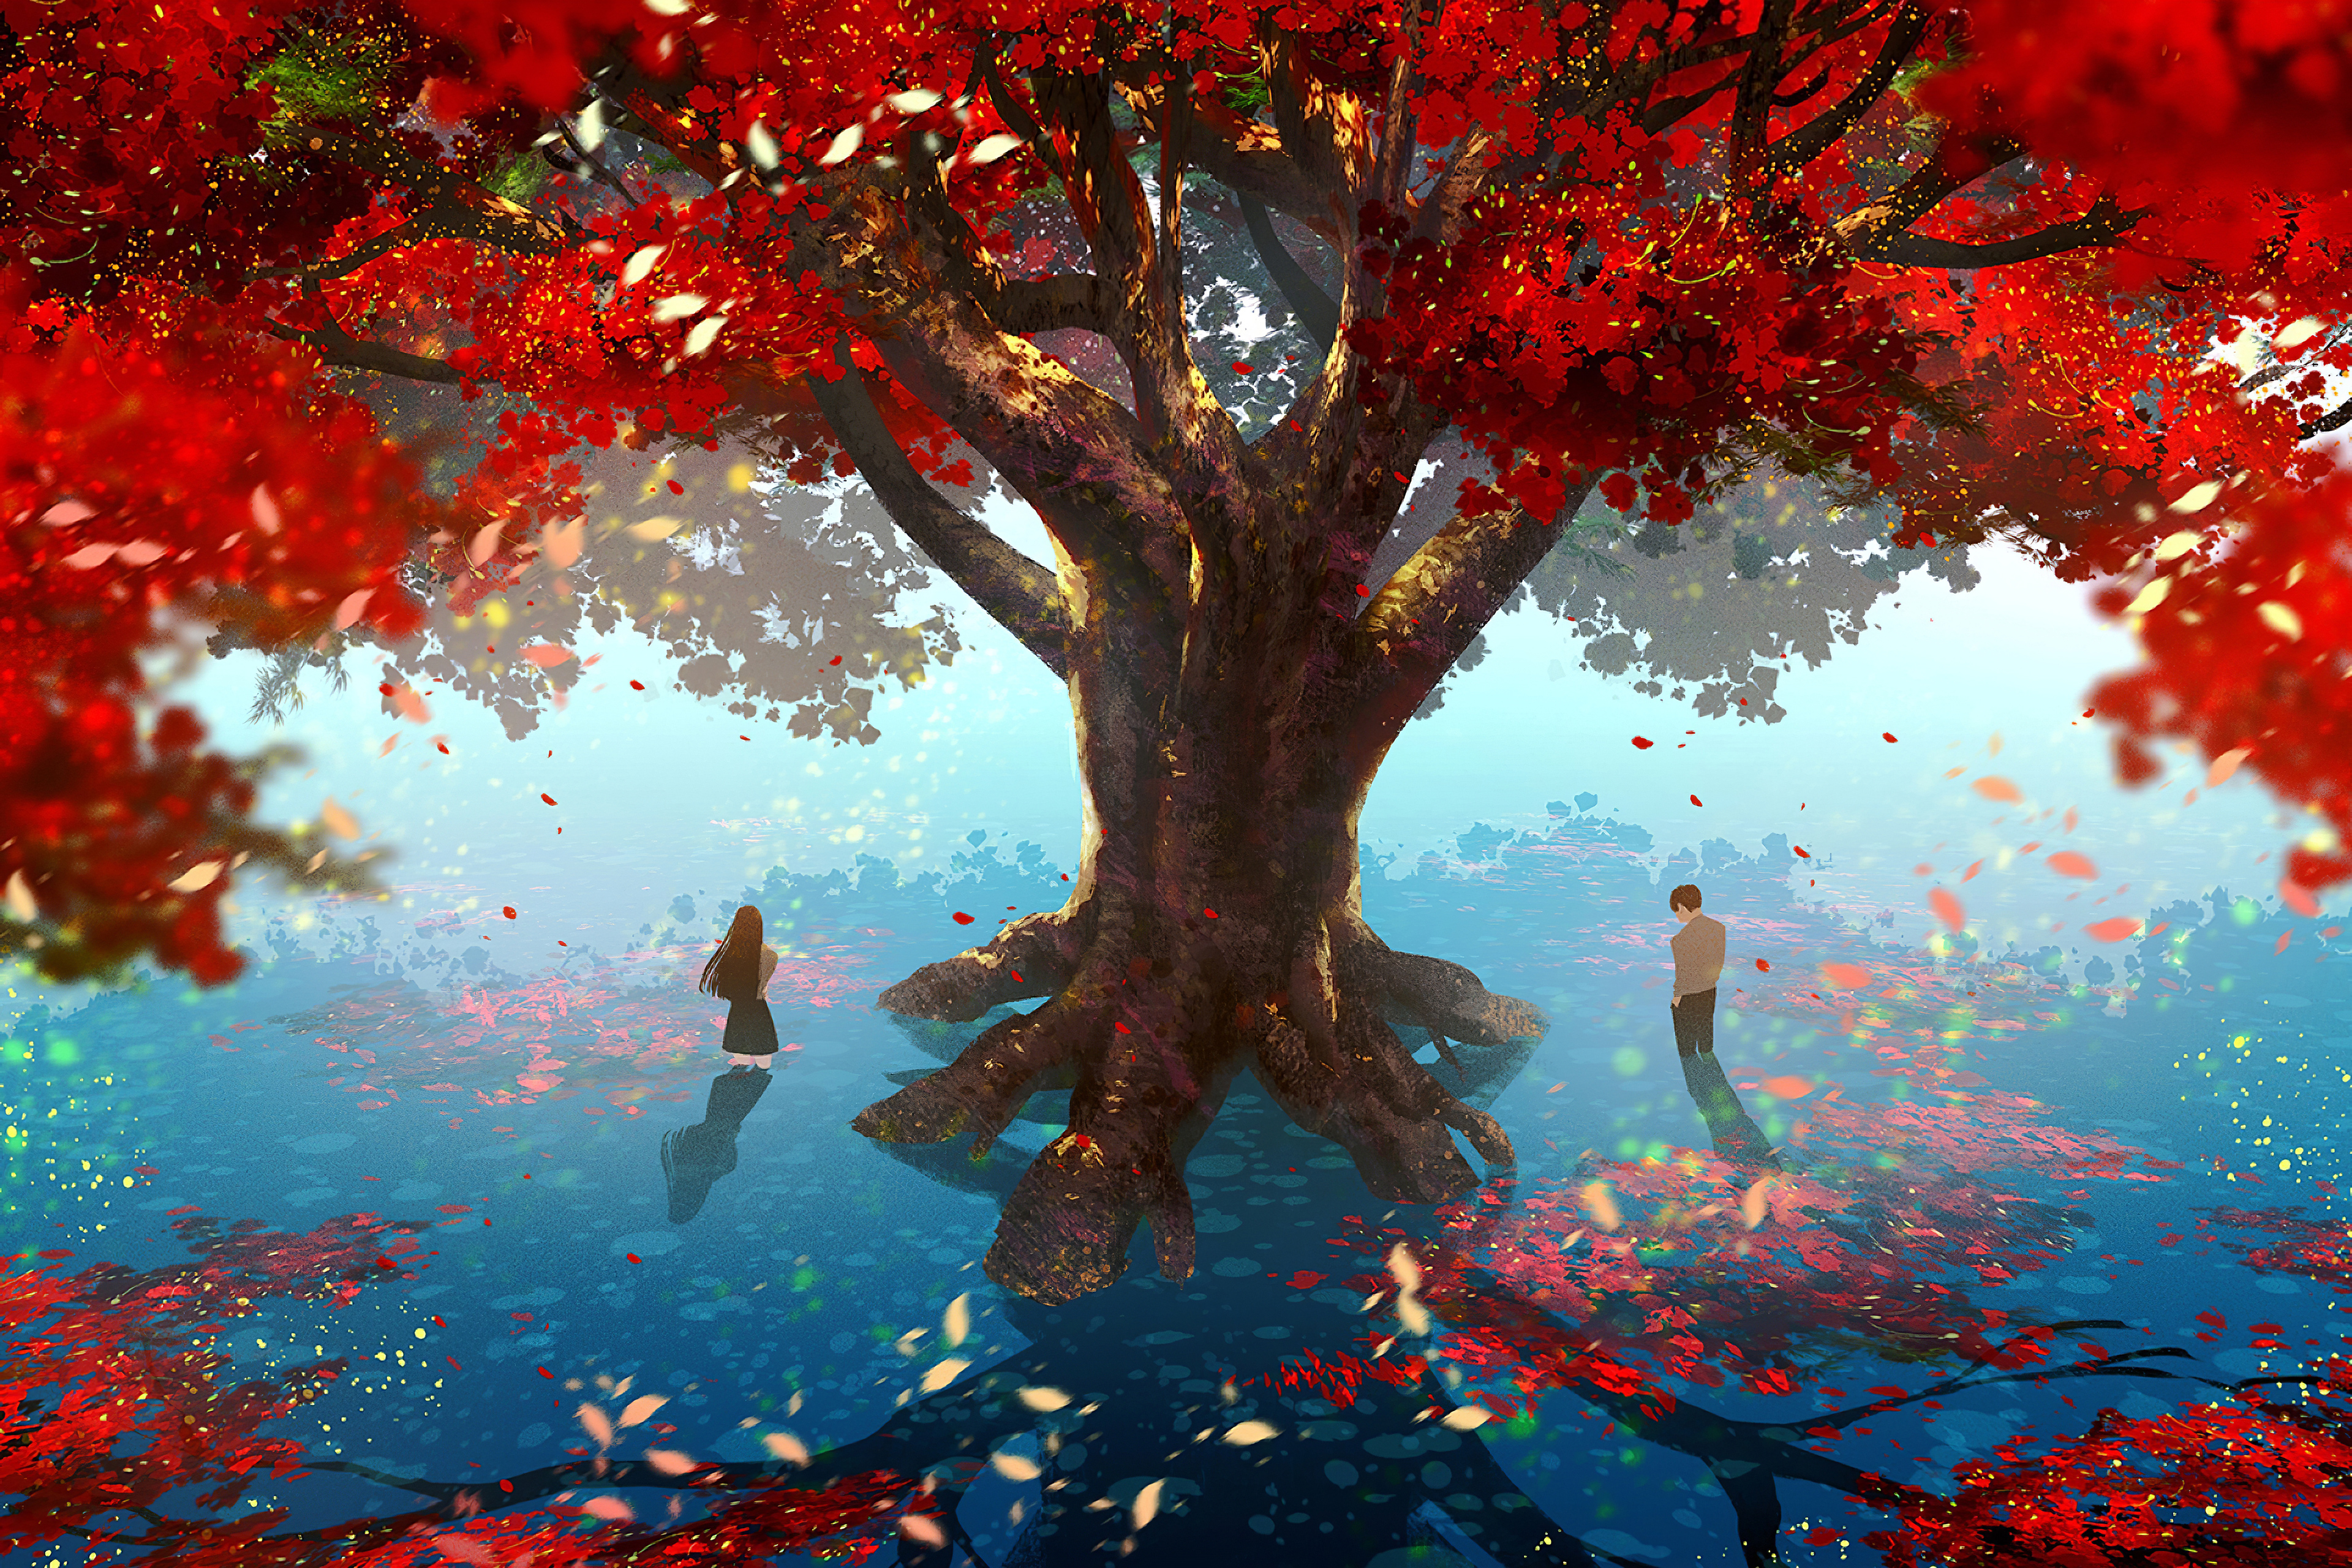 Love Memories With Tree 4k, HD Anime, 4k Wallpapers ...